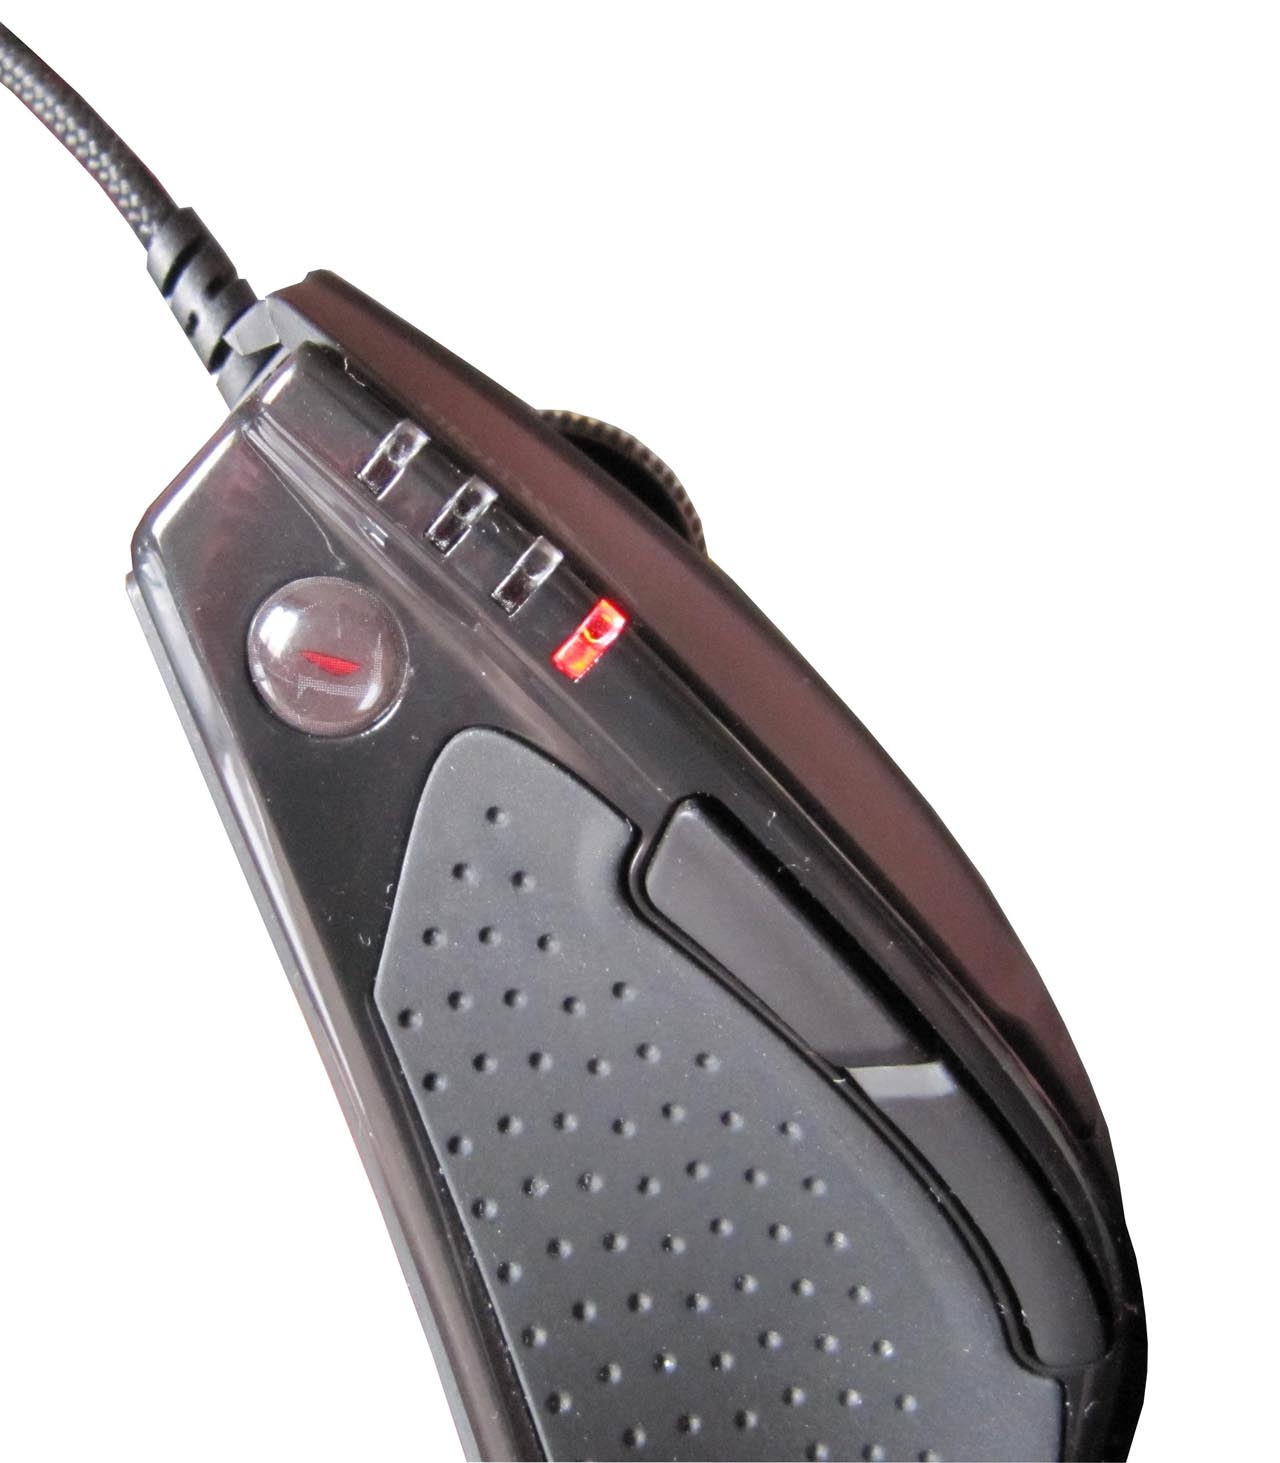 ... Gigabyte Ghost GM-M8000X M8000 Xtreme Black 6000DPI Laser Gaming Mouse